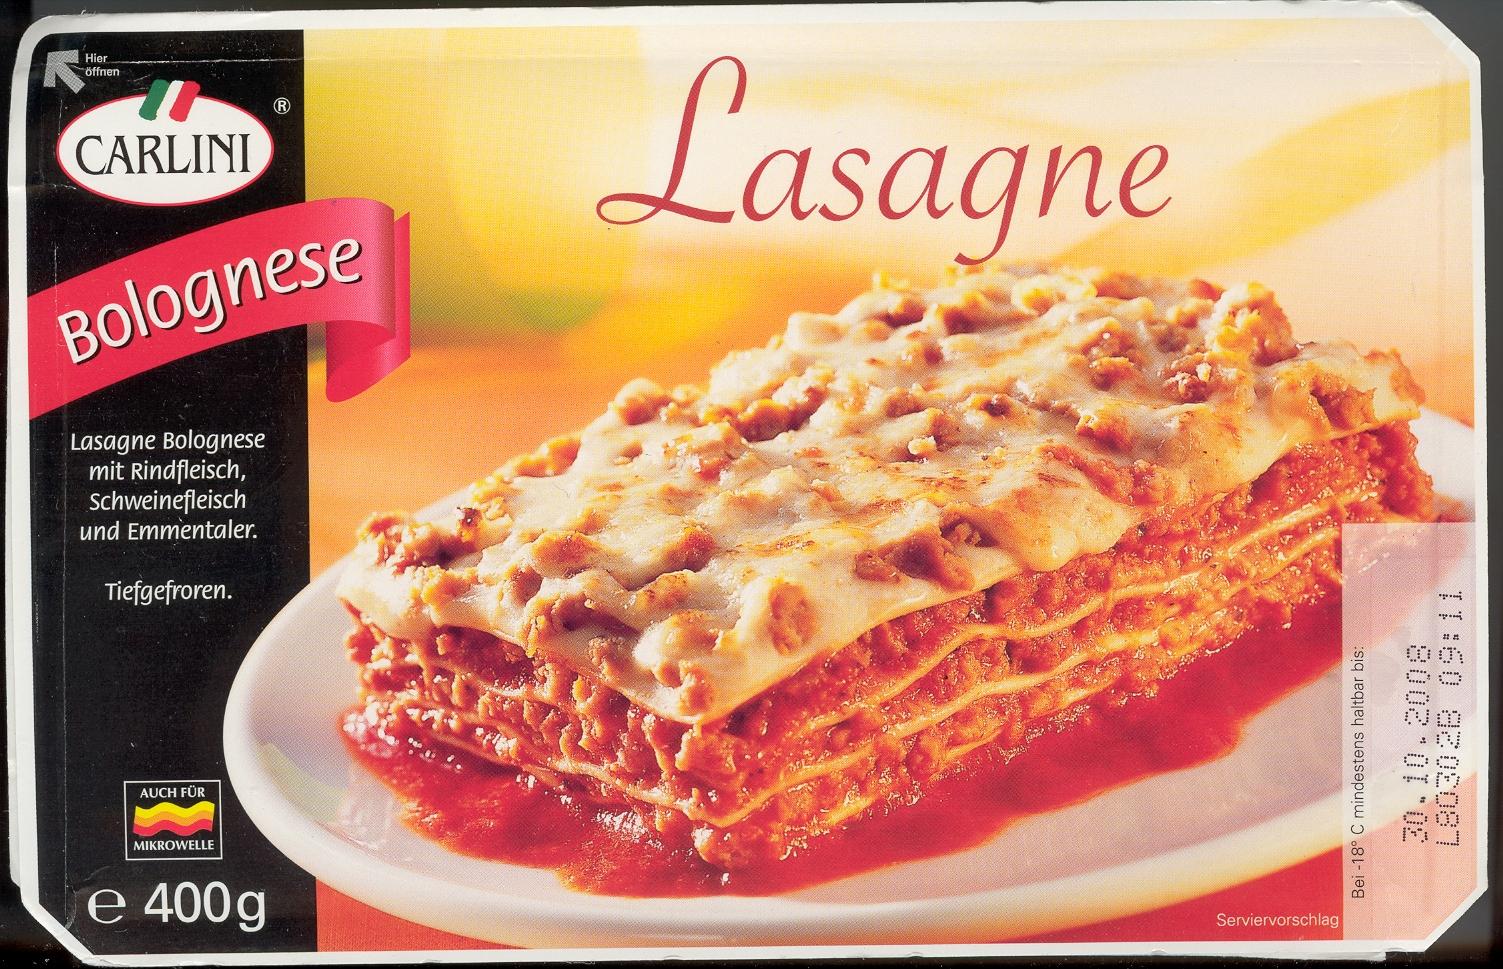 "Foto: Fertiglasagne Marke ""Carlini"" Aldi-Süd"